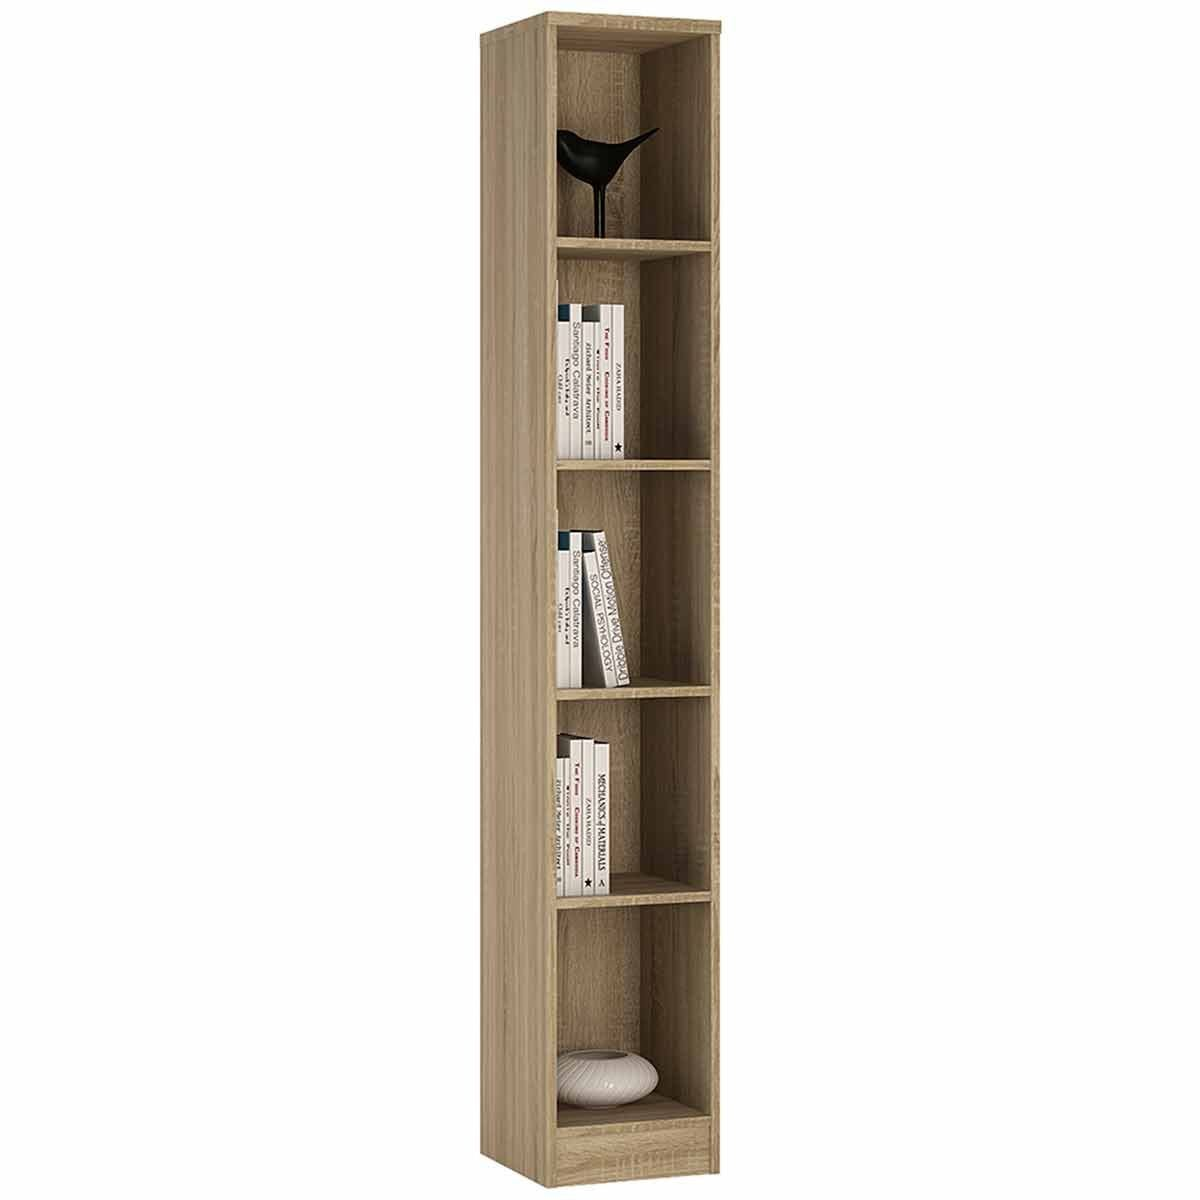 4 You Tall Narrow Bookcase